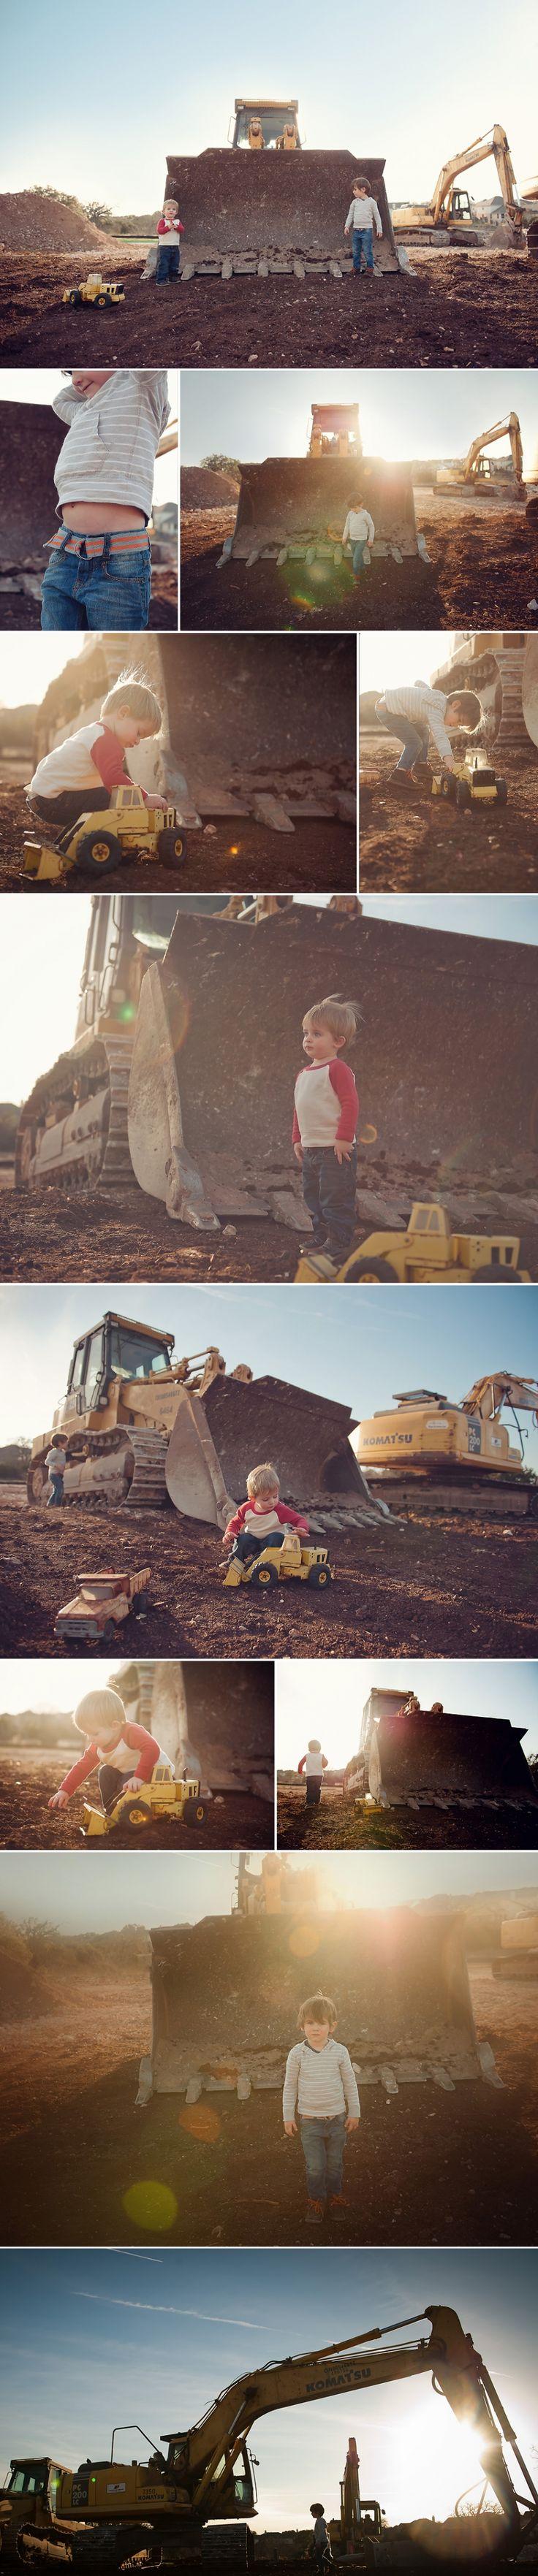 little boy photo shoot